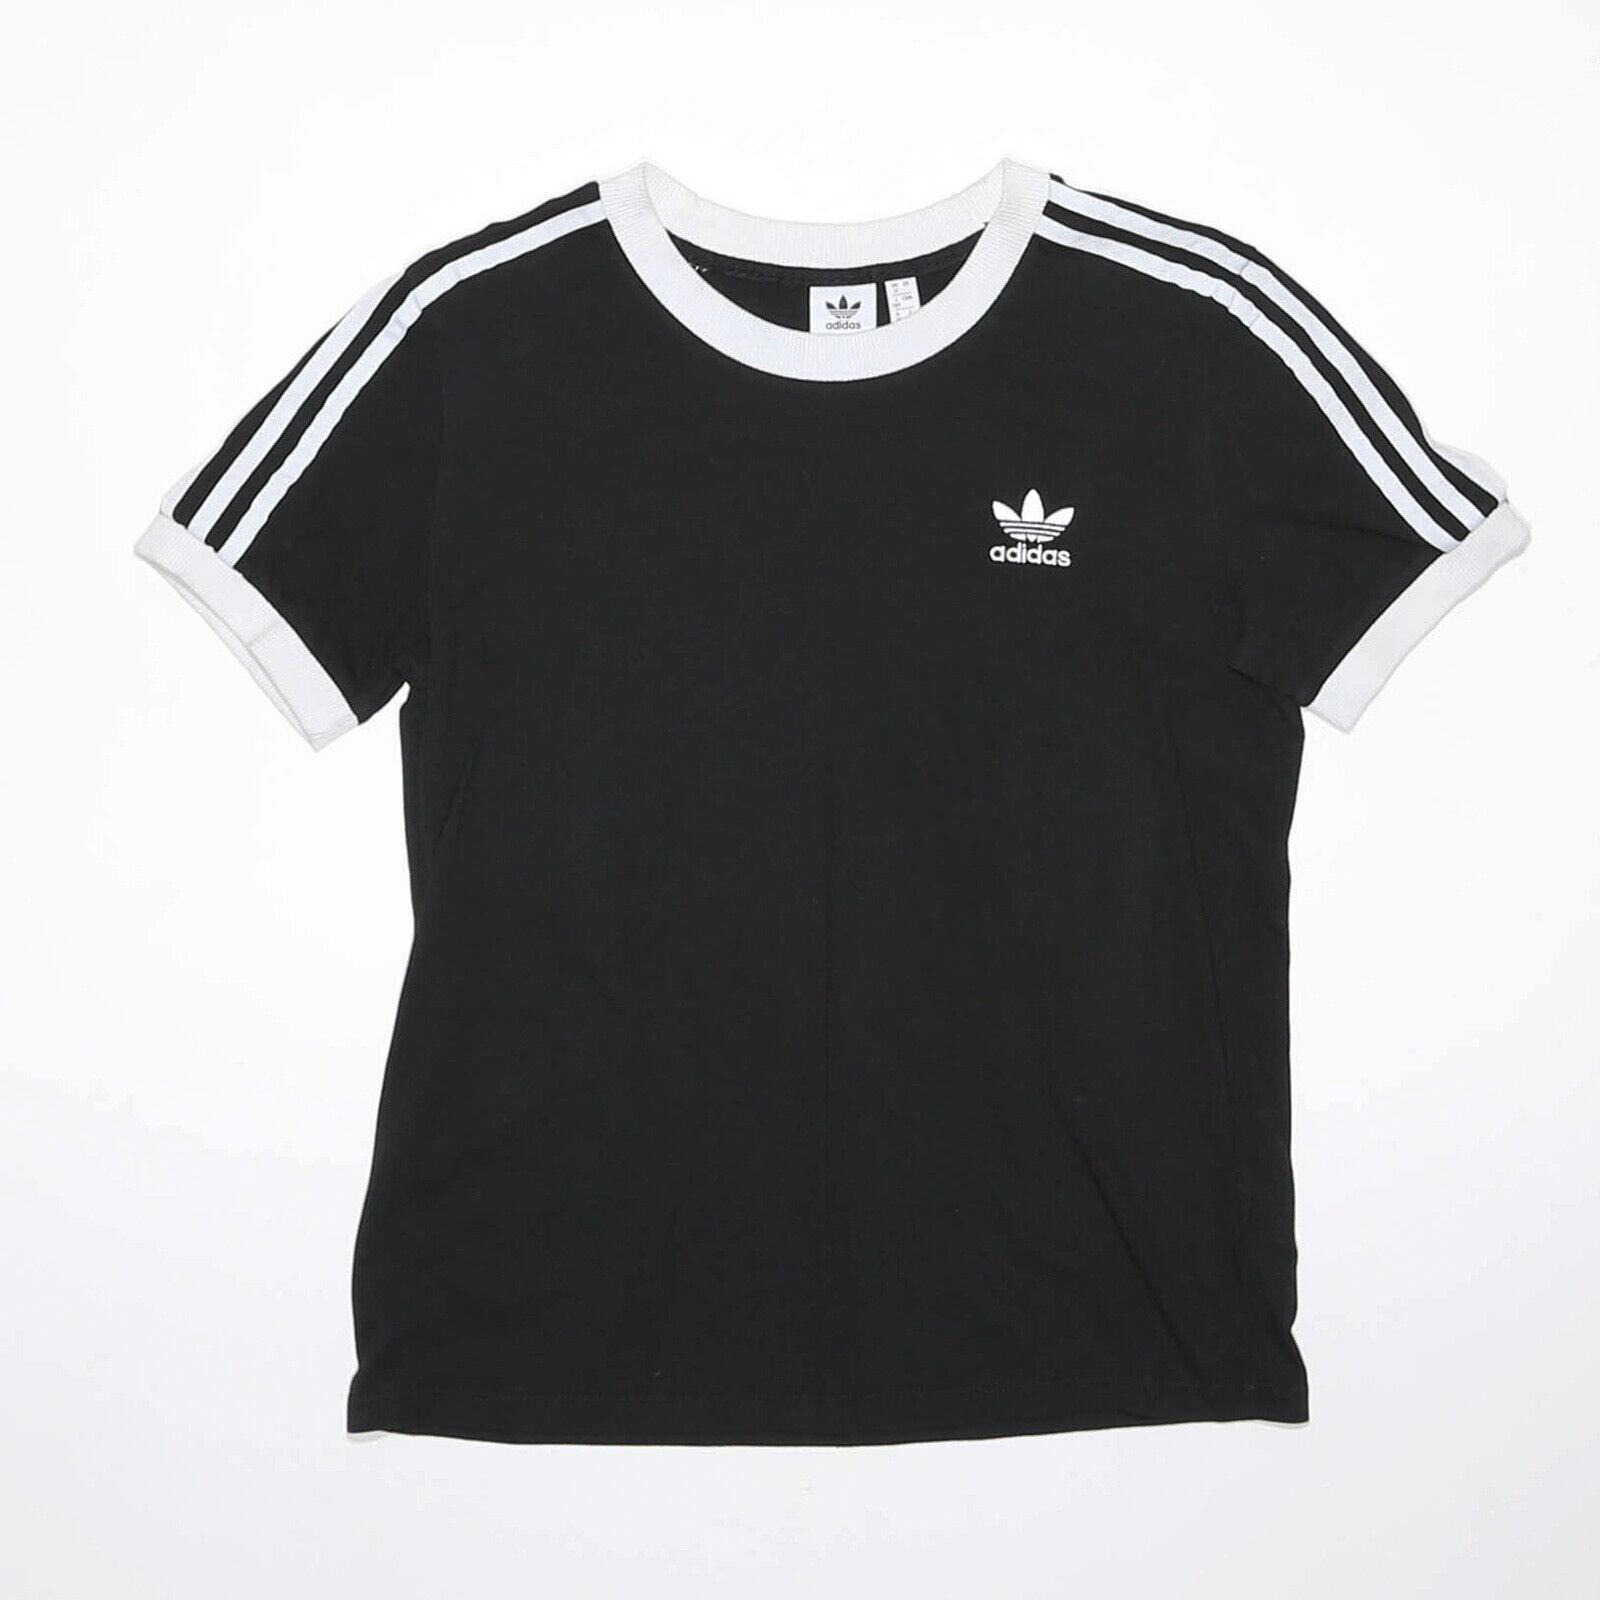 ADIDAS Black Regular Short Sleeve T-Shirt Womens M